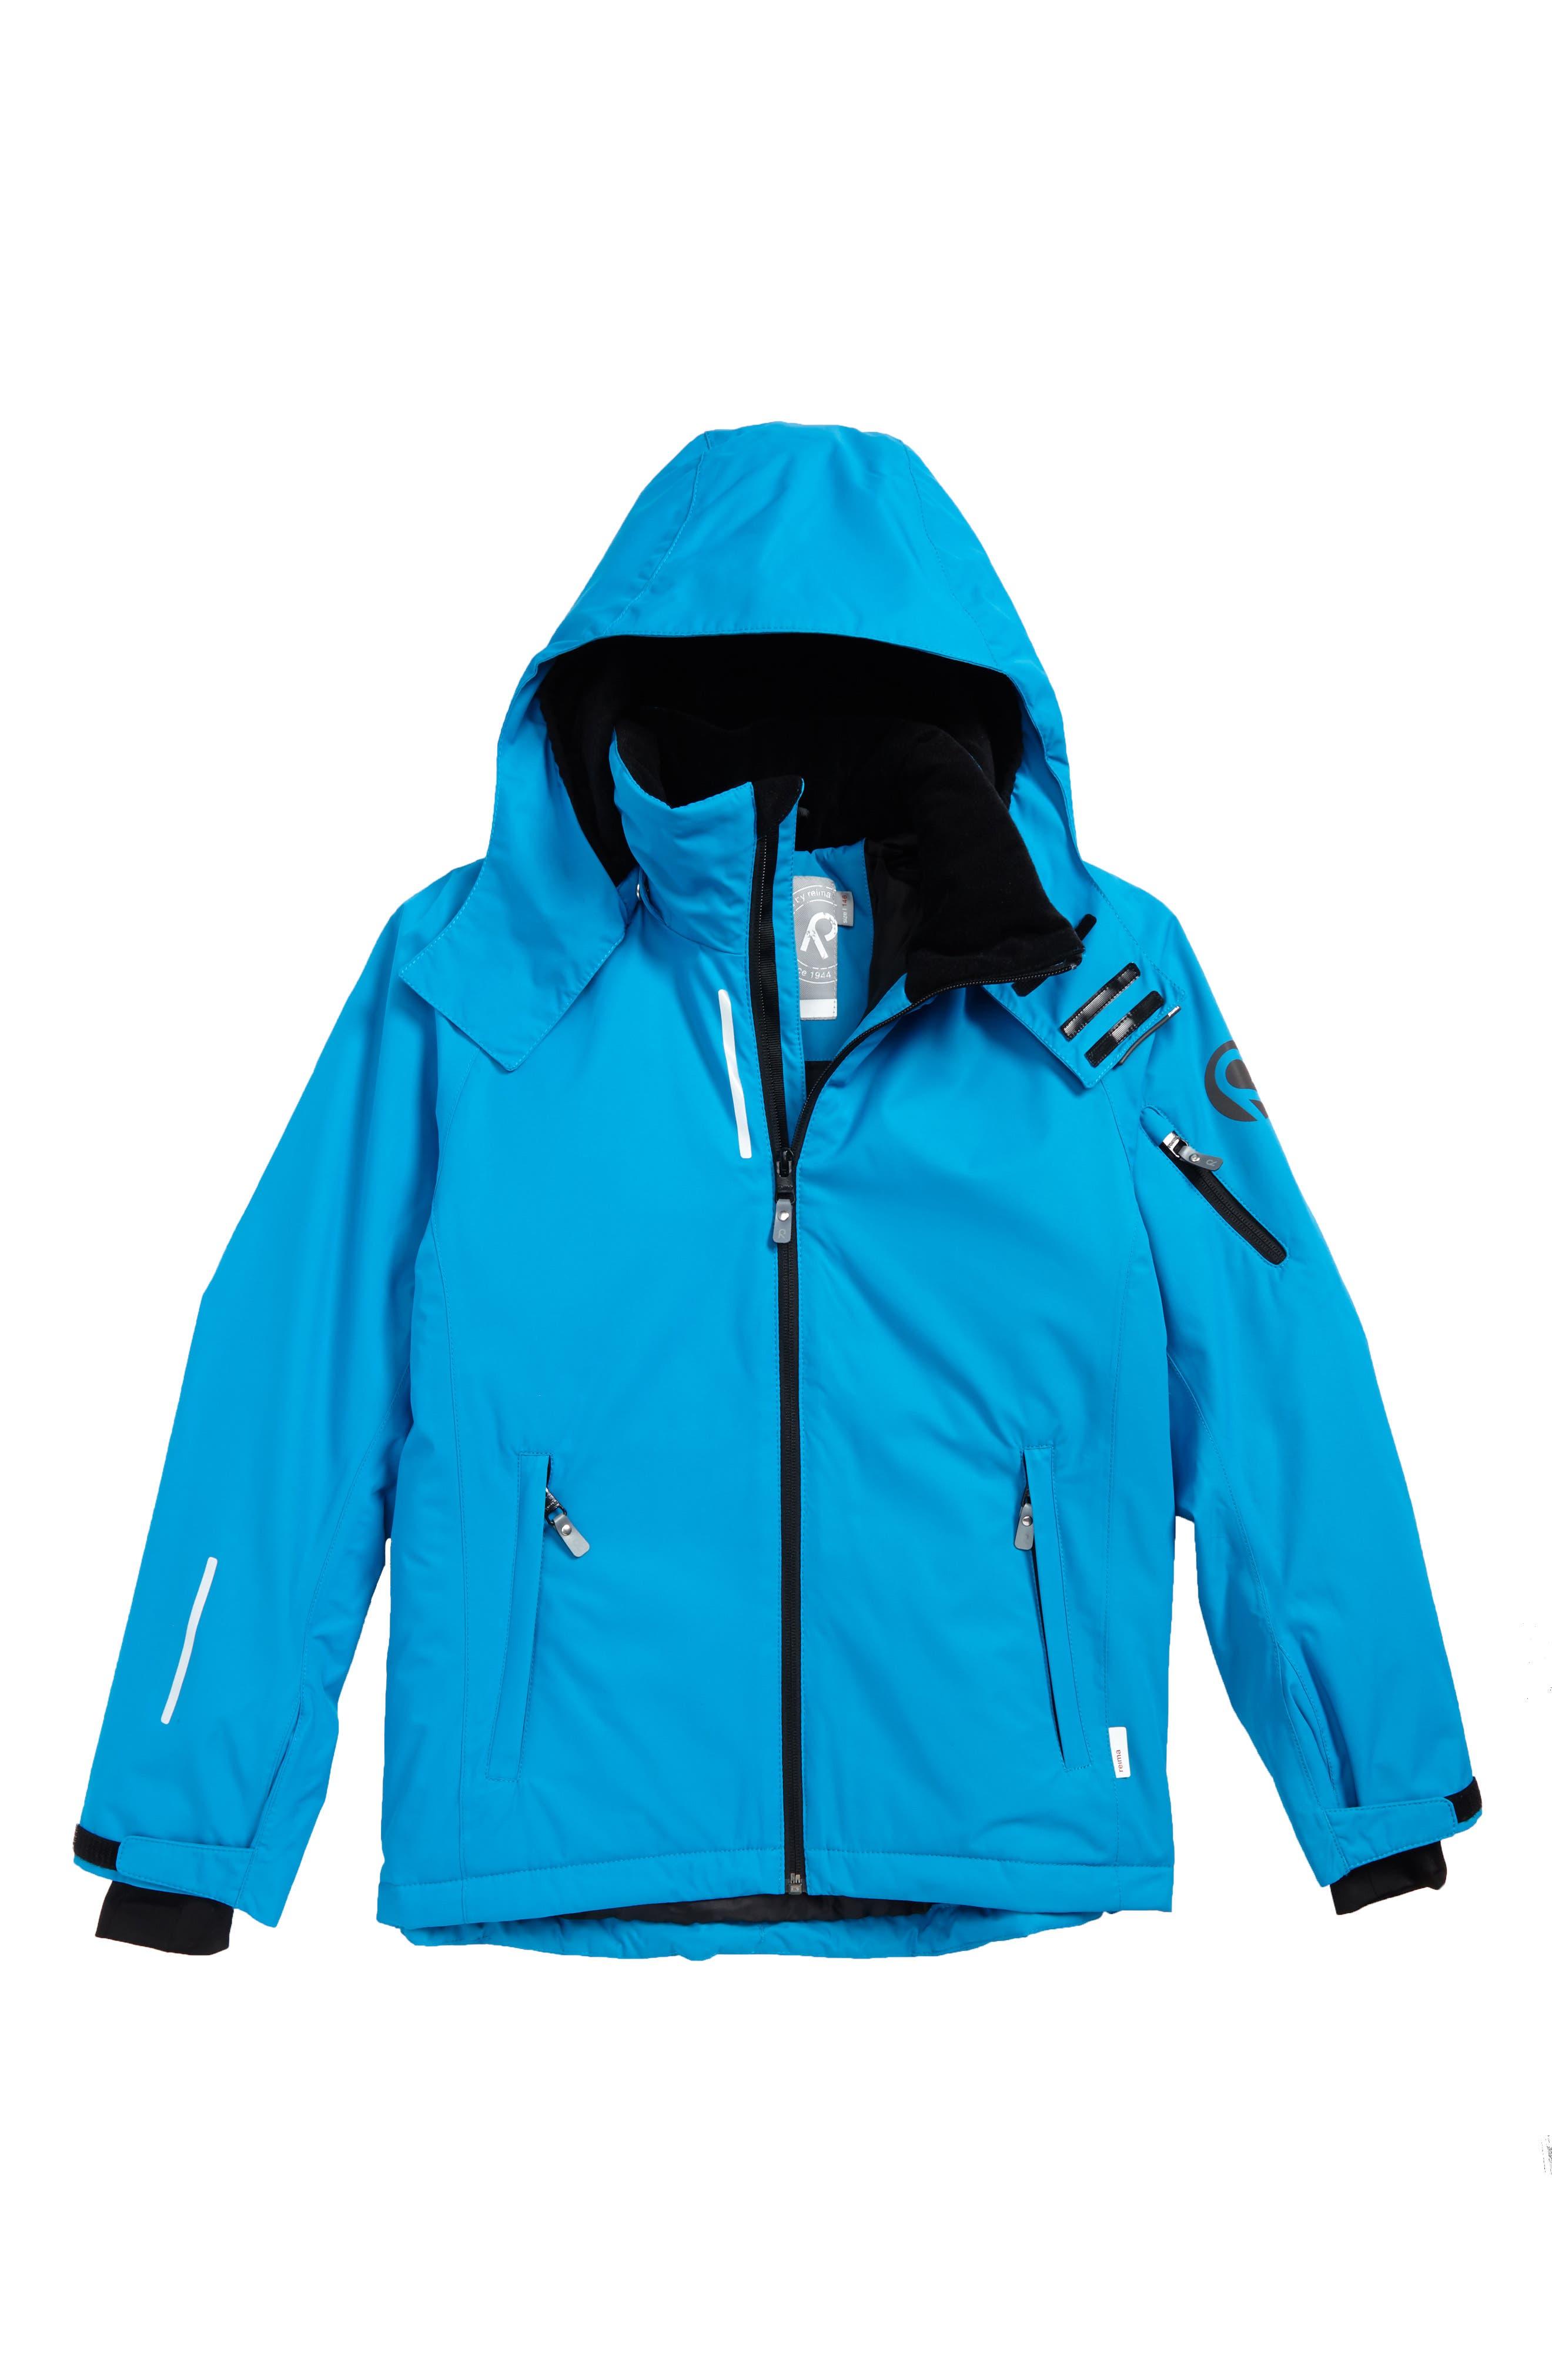 Reimatec<sup>®</sup> Detour Waterproof Hooded Jacket,                         Main,                         color, Blue